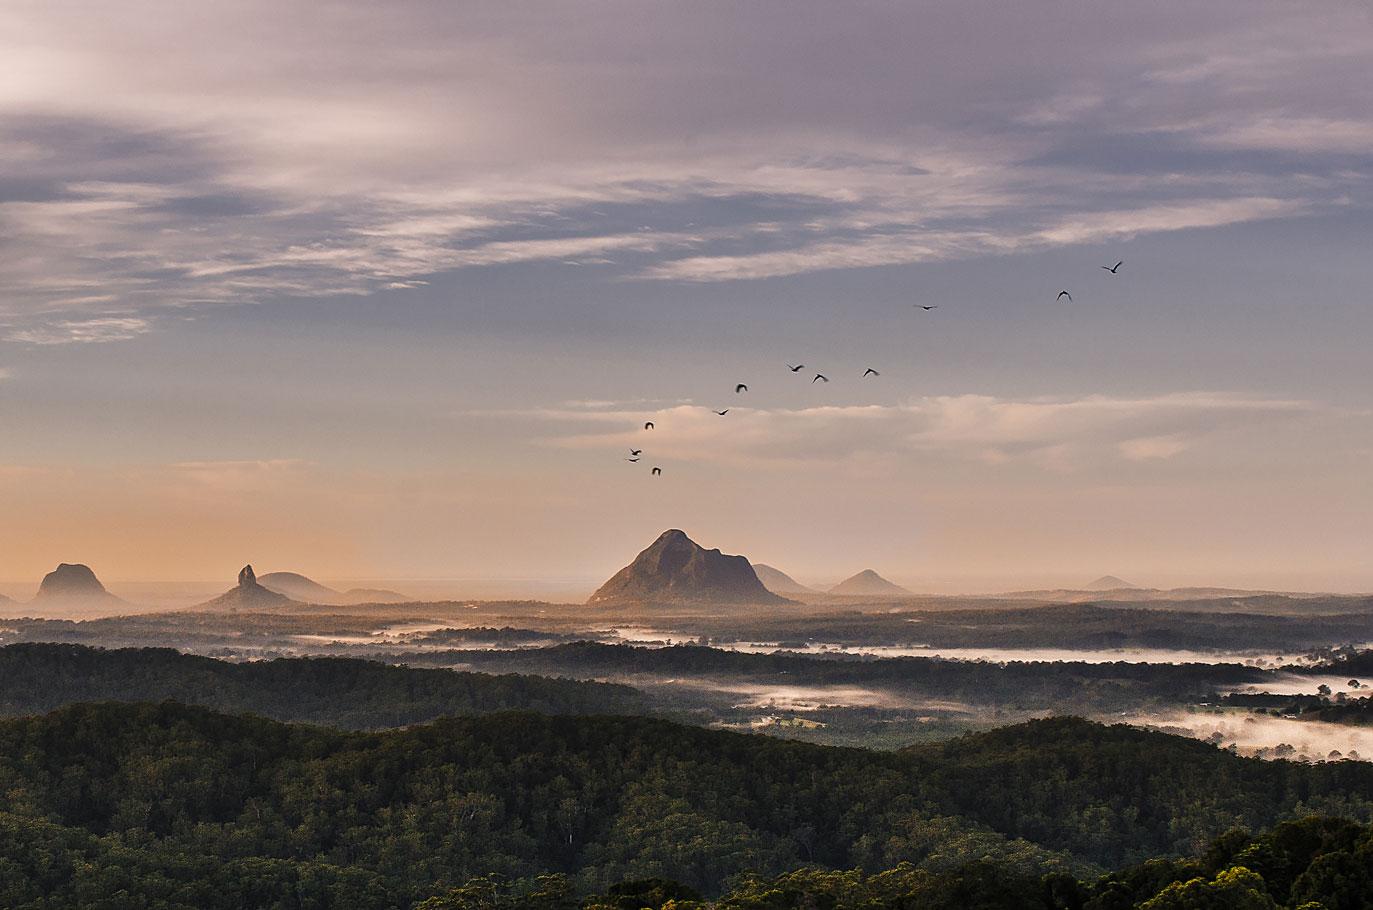 Paesaggi-Australia - DSC 8922 - Glass-house-mountains-Australia - Glass-house-mountains-Australia